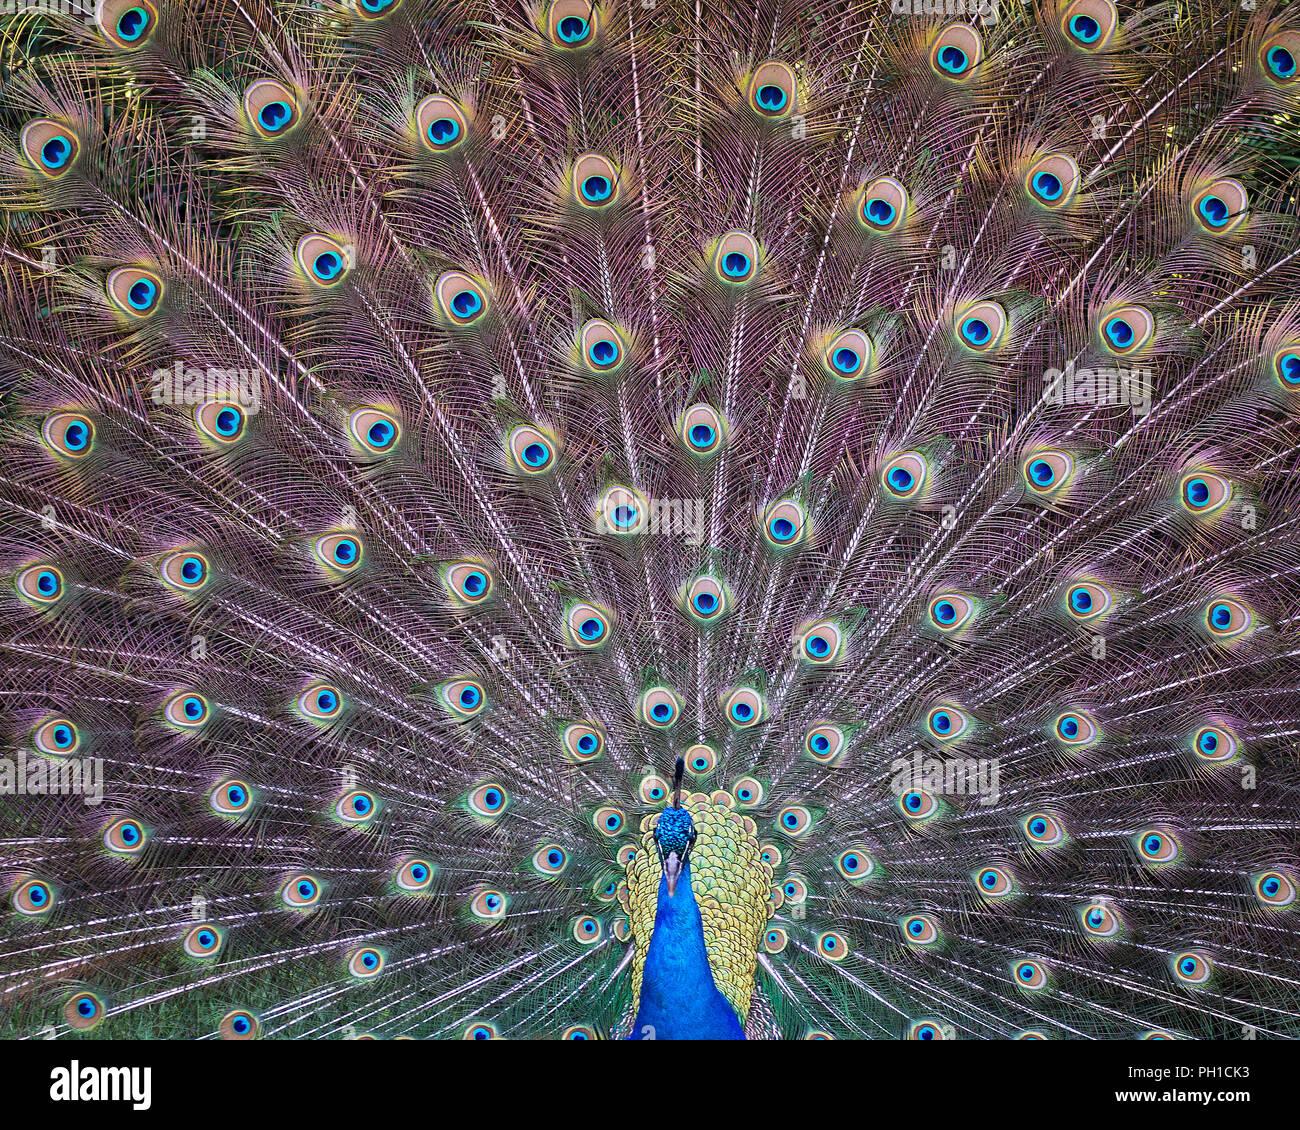 Peacock bird displaying his plumage and enjoying its surrounding. Stock Photo